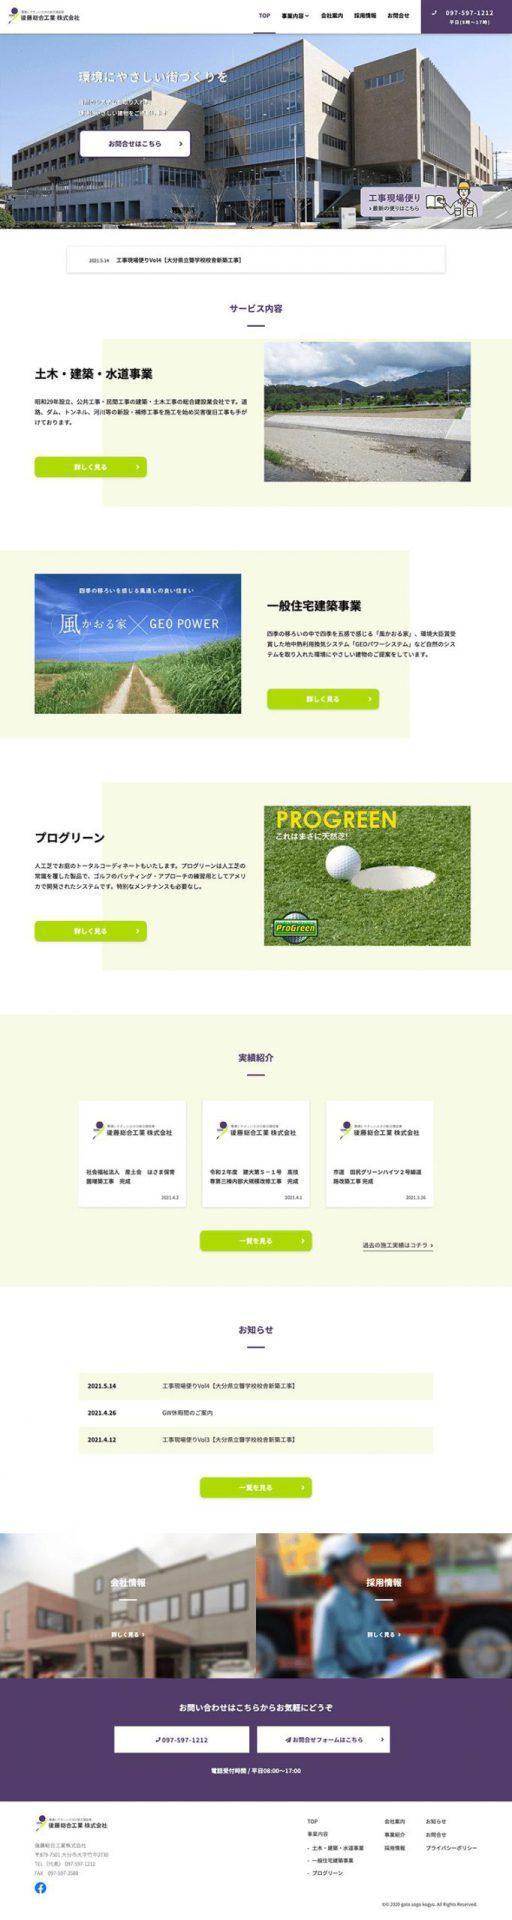 Webマーケティング_制作実績_後藤総合工業 株式会社_2